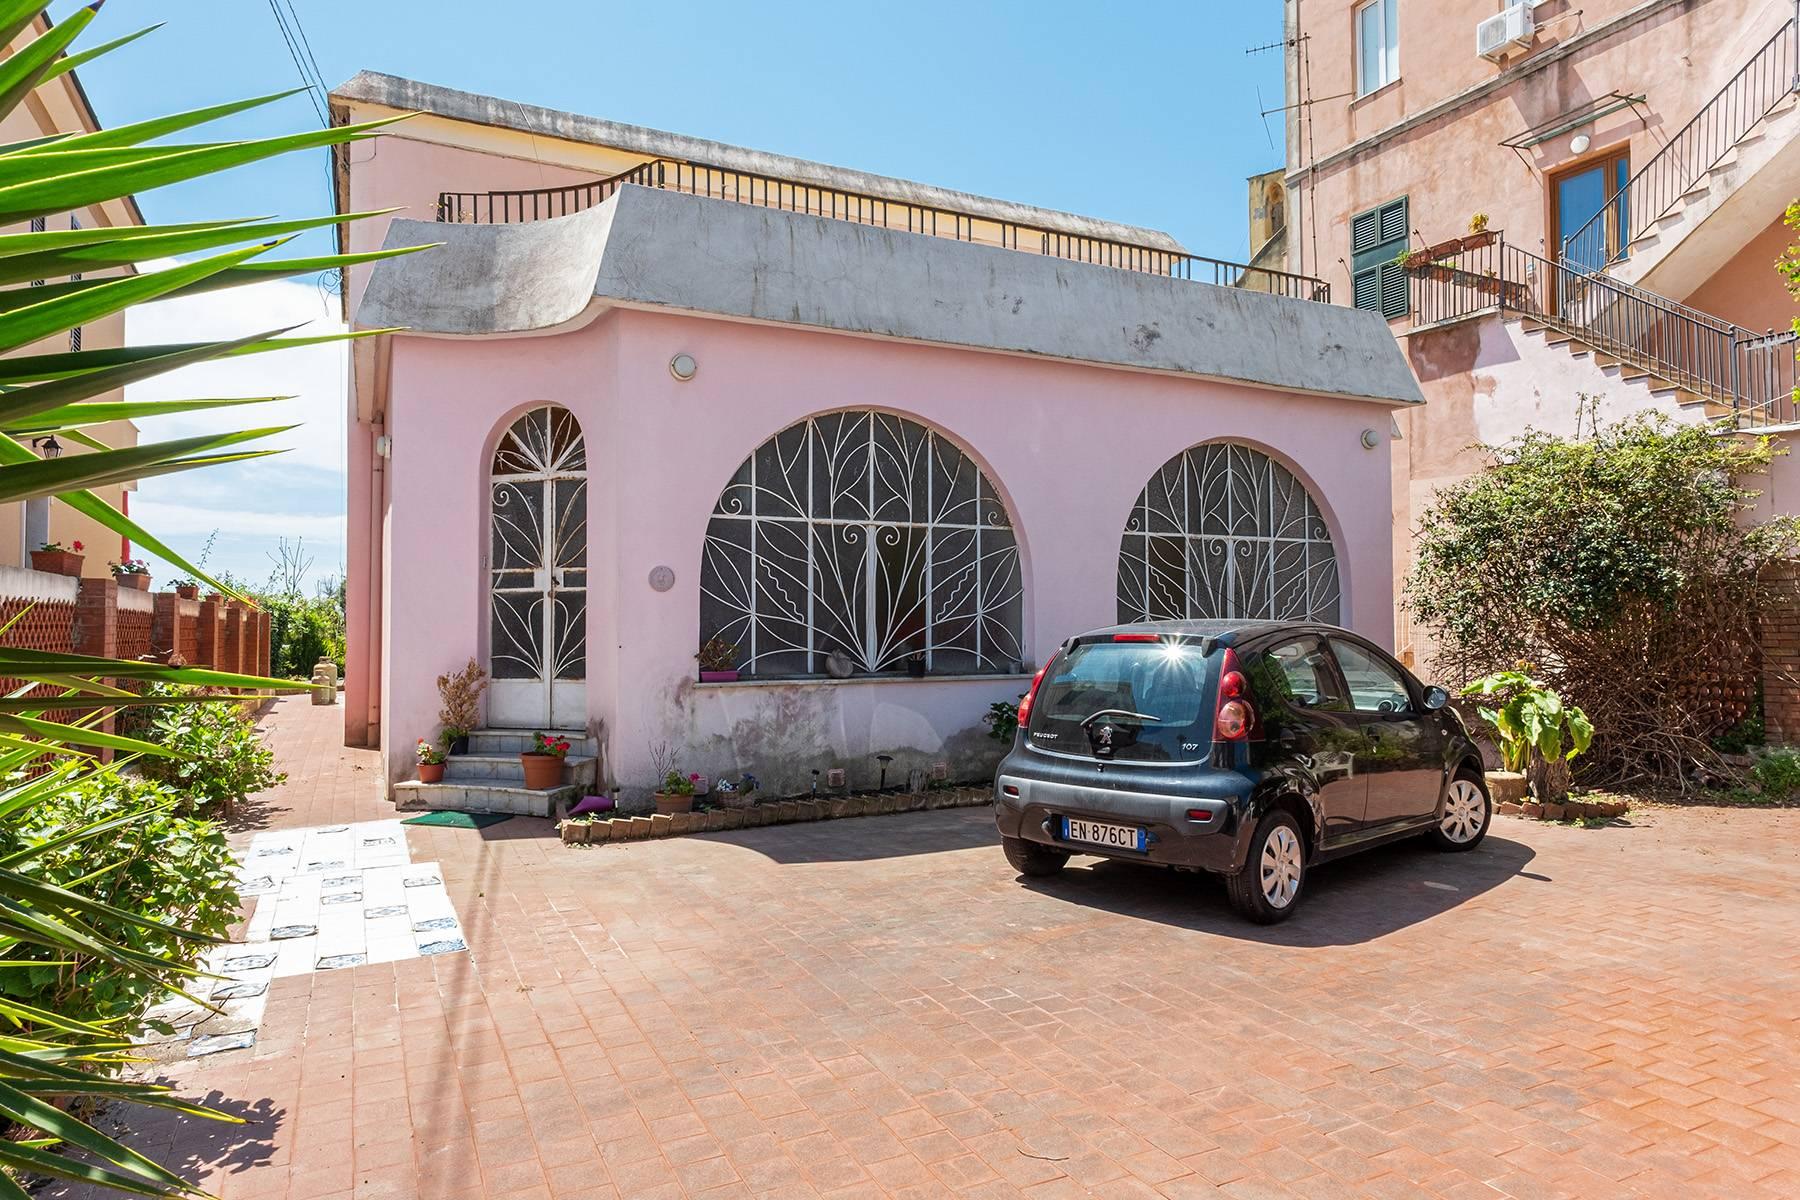 Casa indipendente in Vendita a Procida: 5 locali, 300 mq - Foto 18